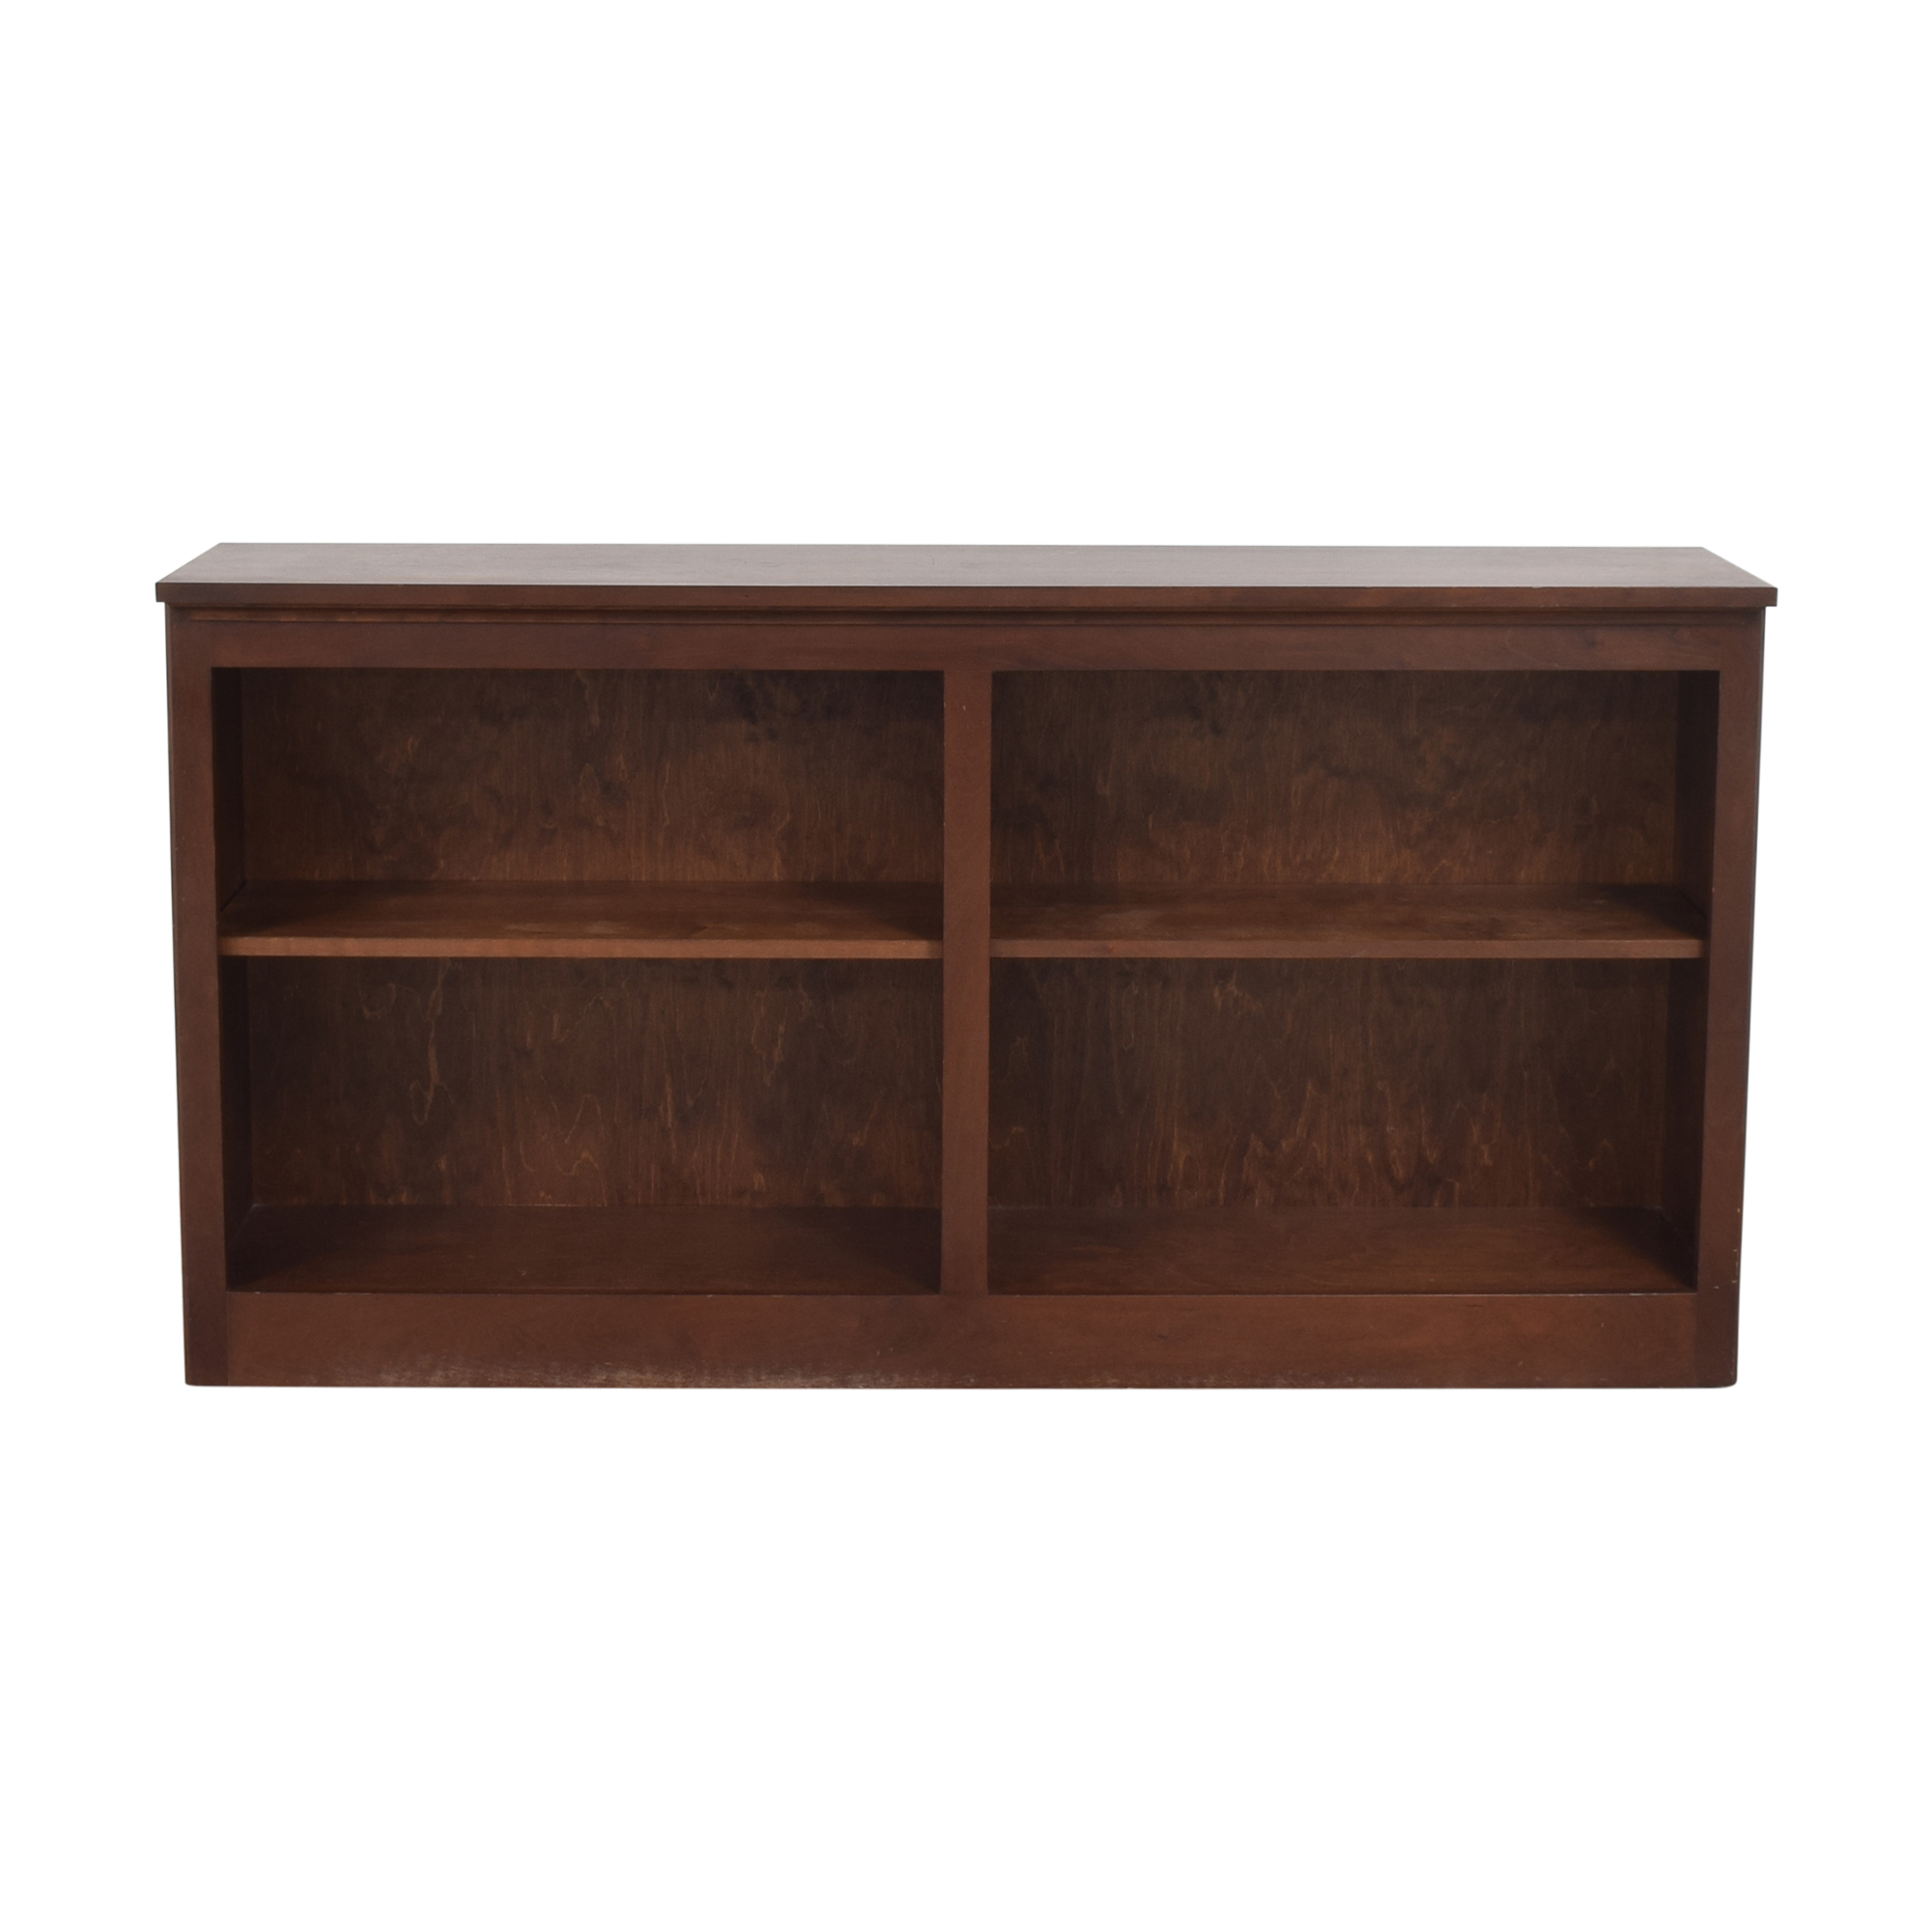 Console Bookcase on sale